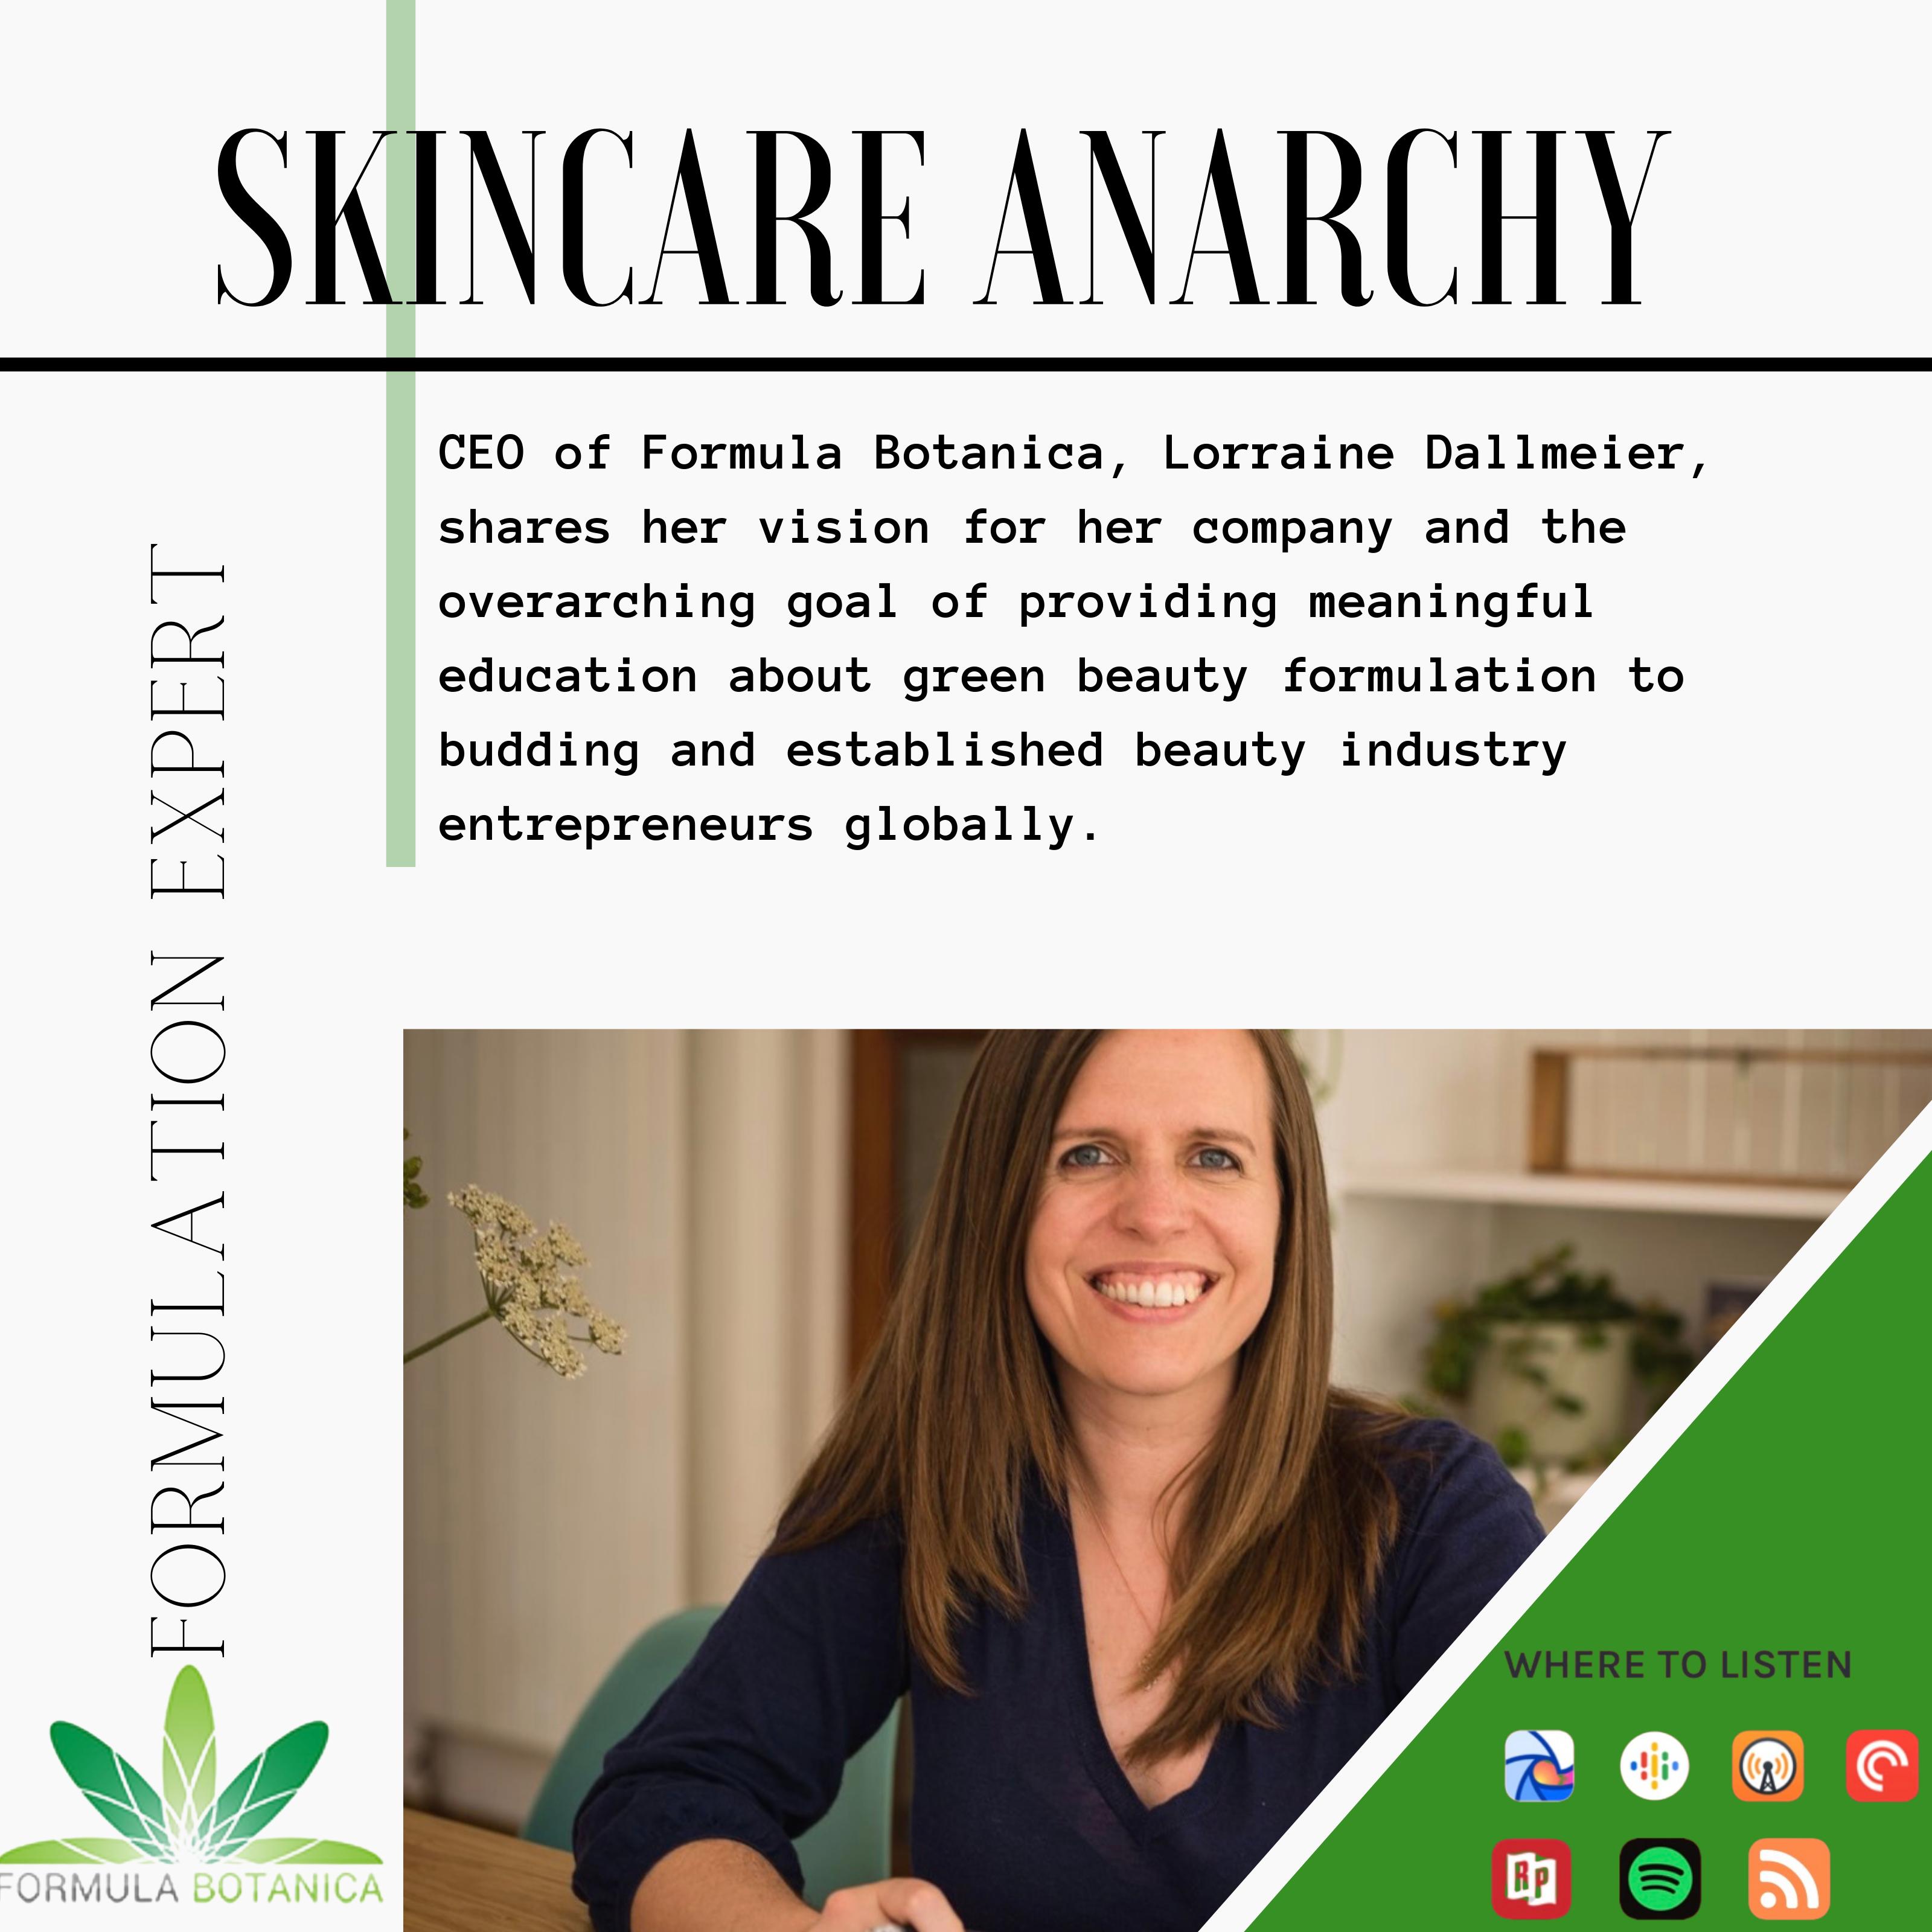 Skincare Anarchy Podcast - Lorraine Dallmeier